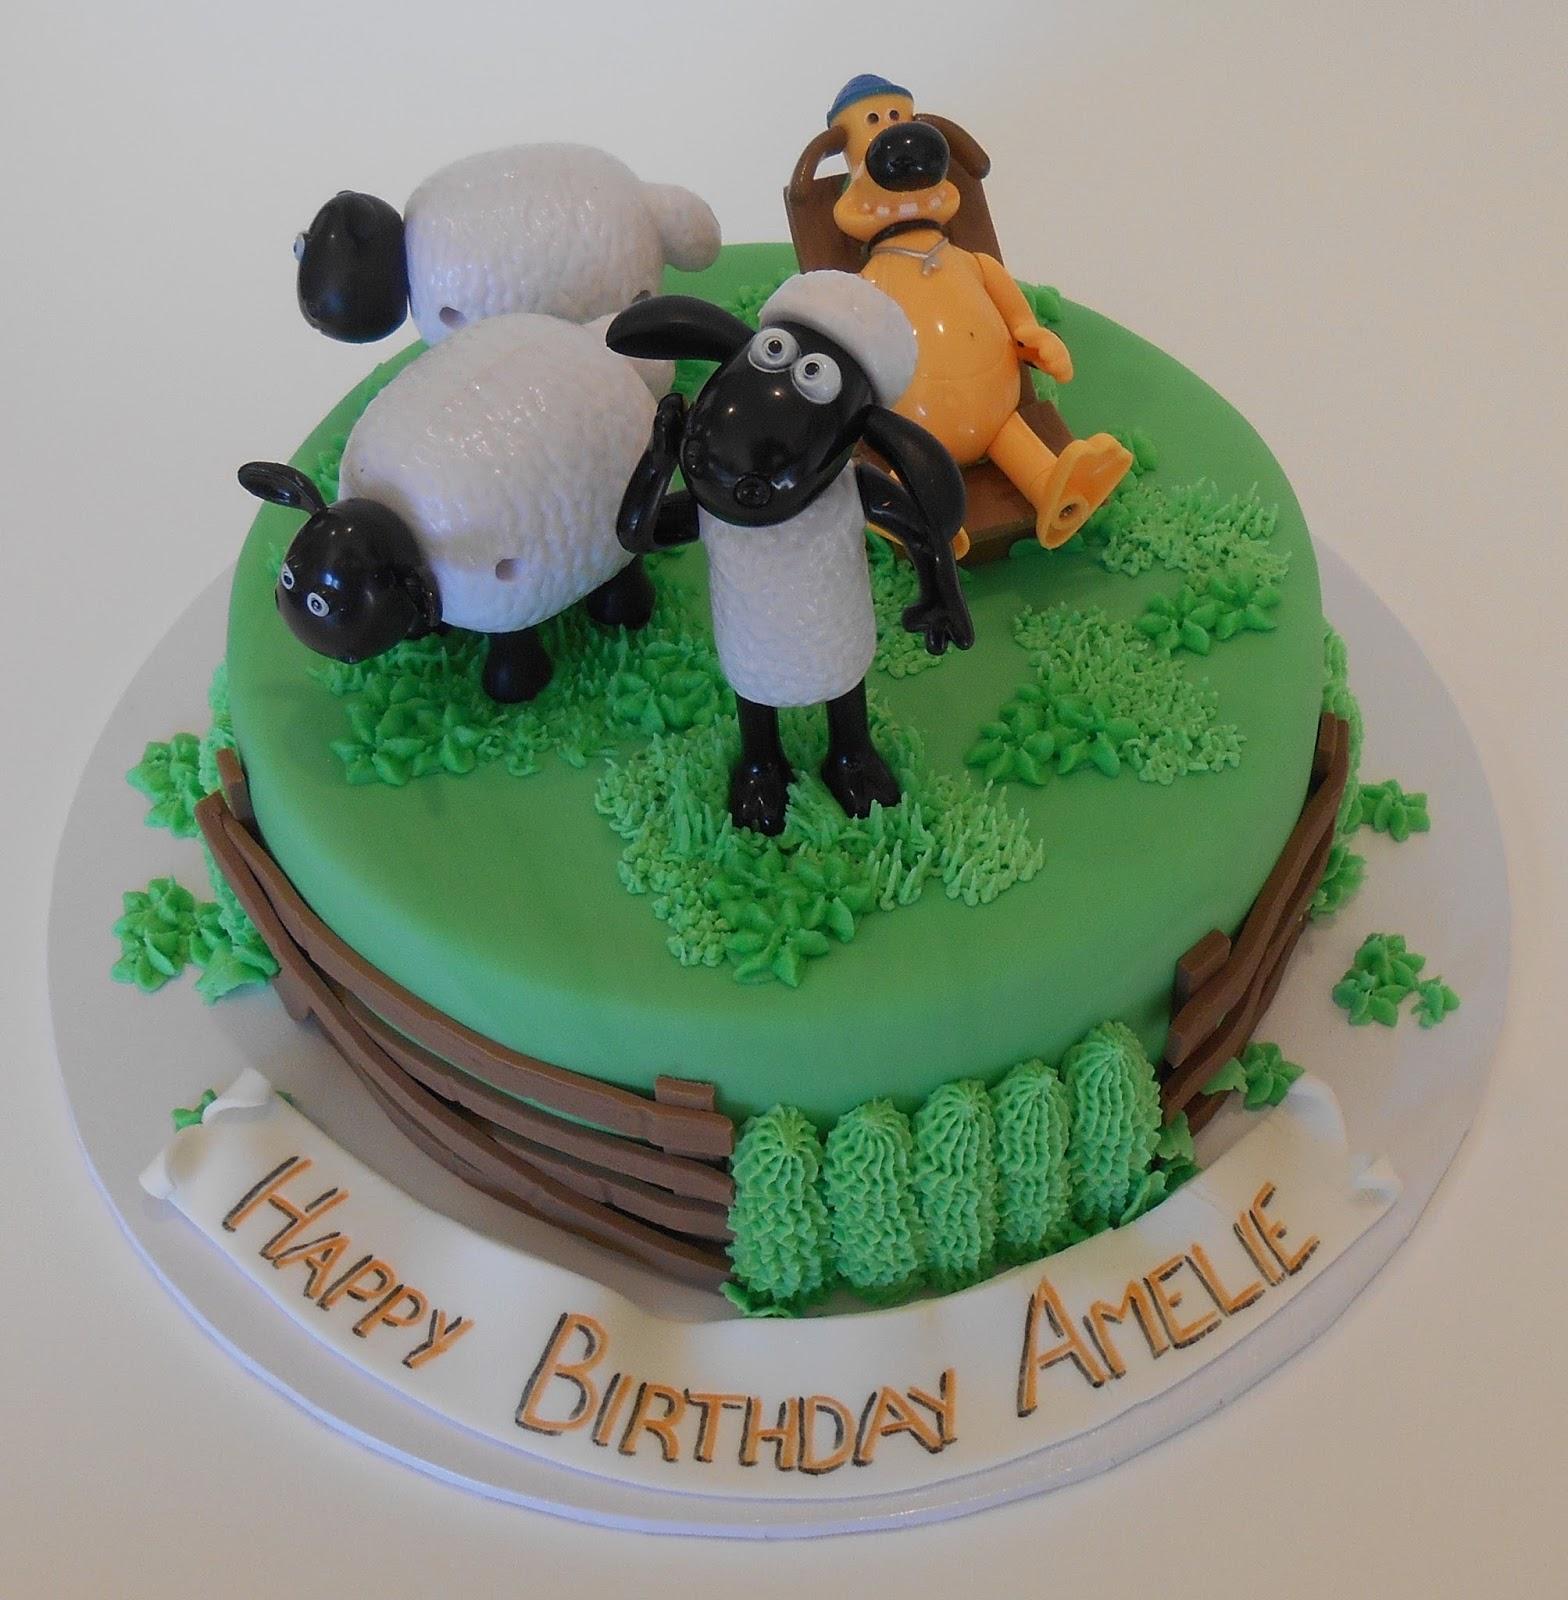 Nadas Cakes Shaun The Sheep Themed Birthday Cake By Nadas Cakes